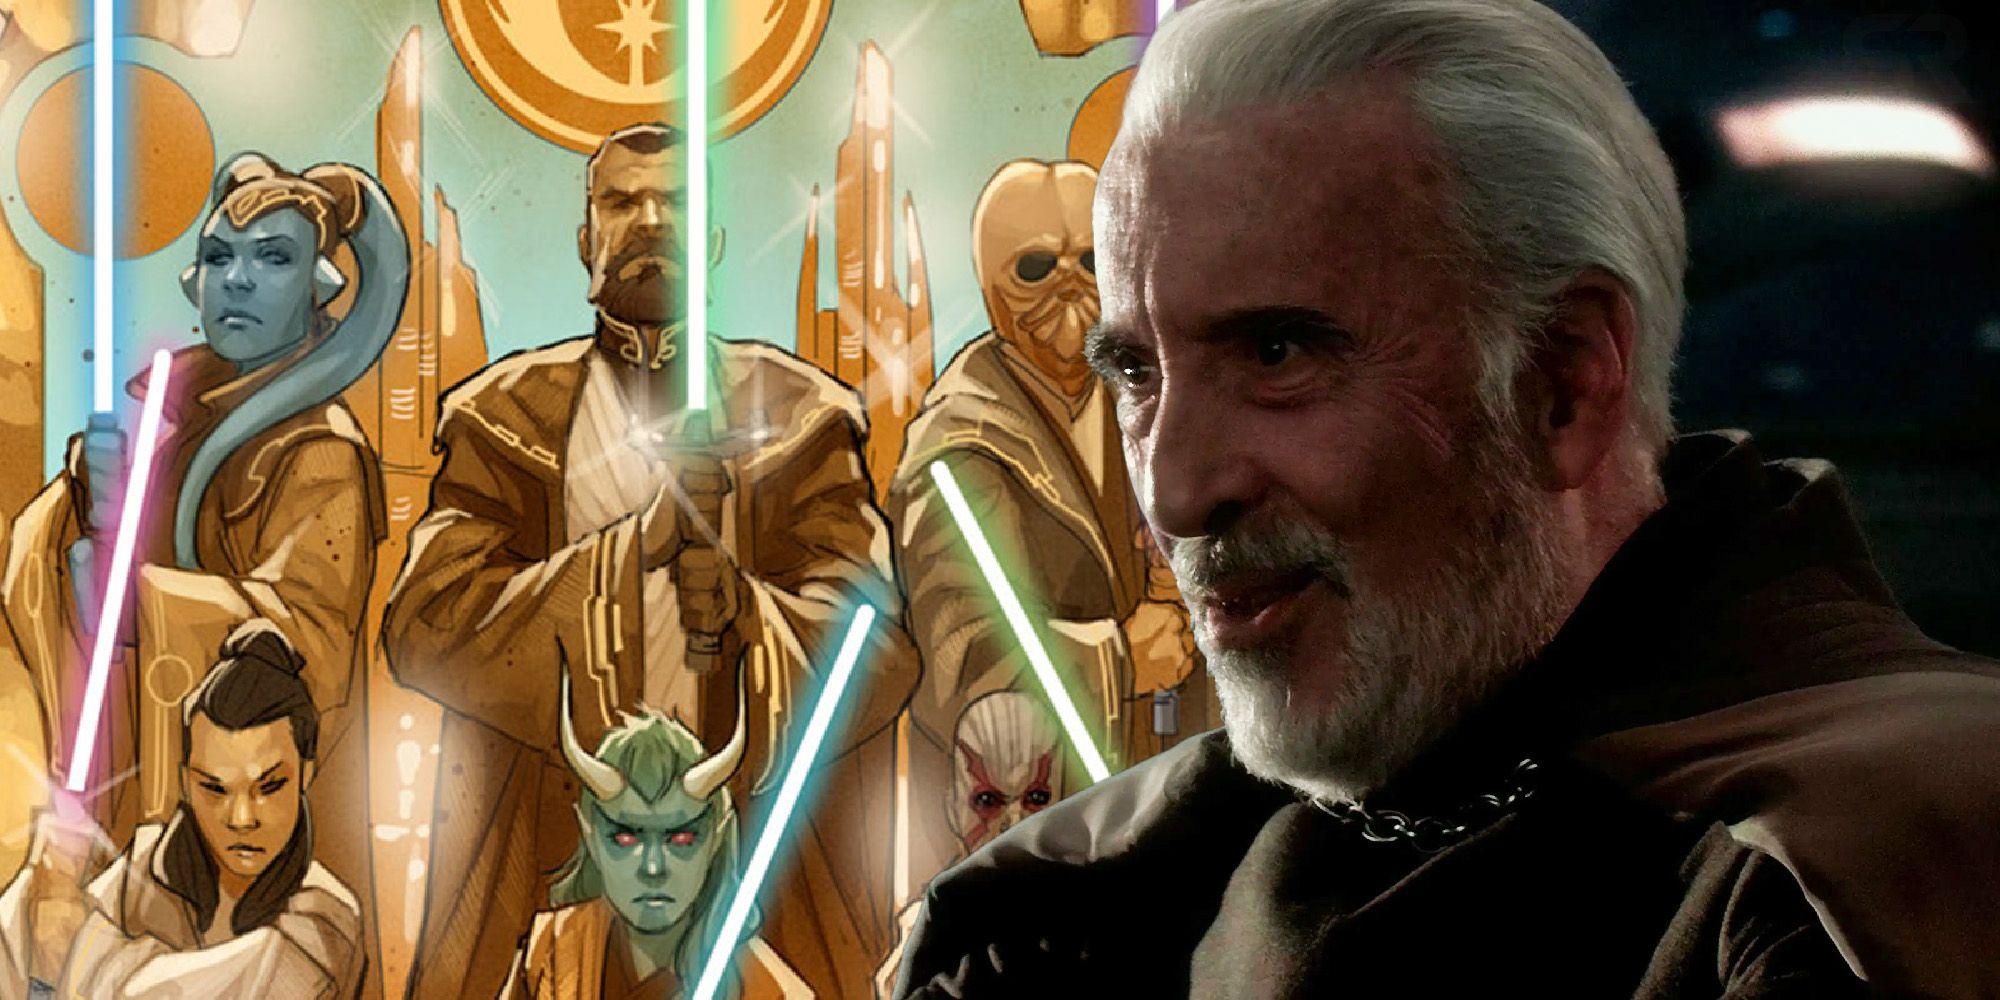 Star Wars Reveals Count Dooku's Deep Backstory | Screen Rant